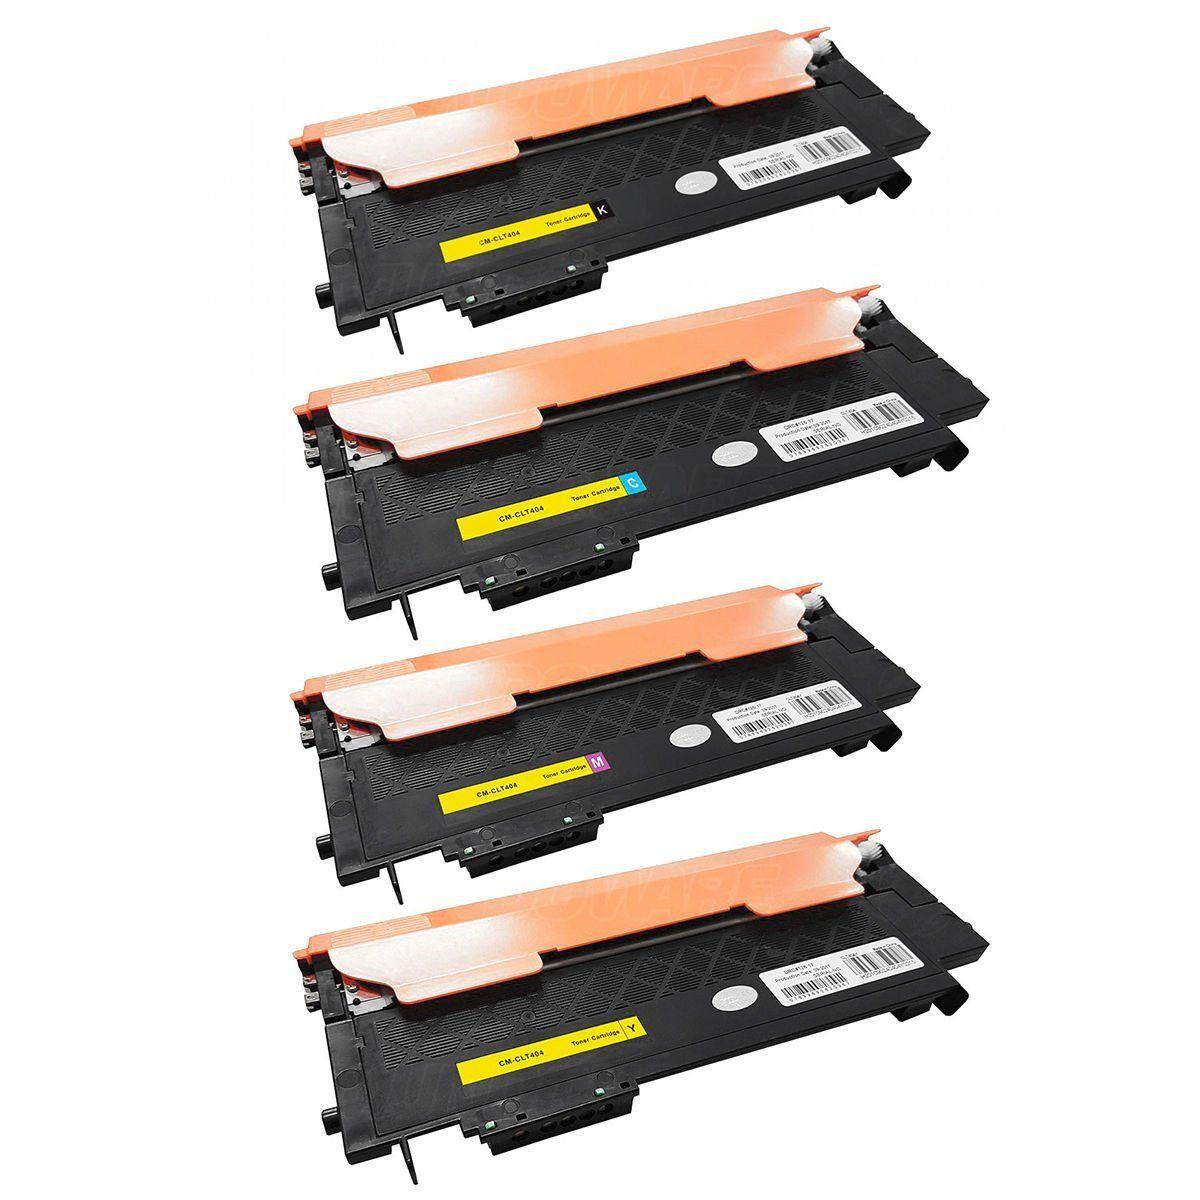 Compatível: Kit Colorido de Toner CLT404 404S para Impressora Samsung SL-C430 C430w C480 C480w C480fn C480fw